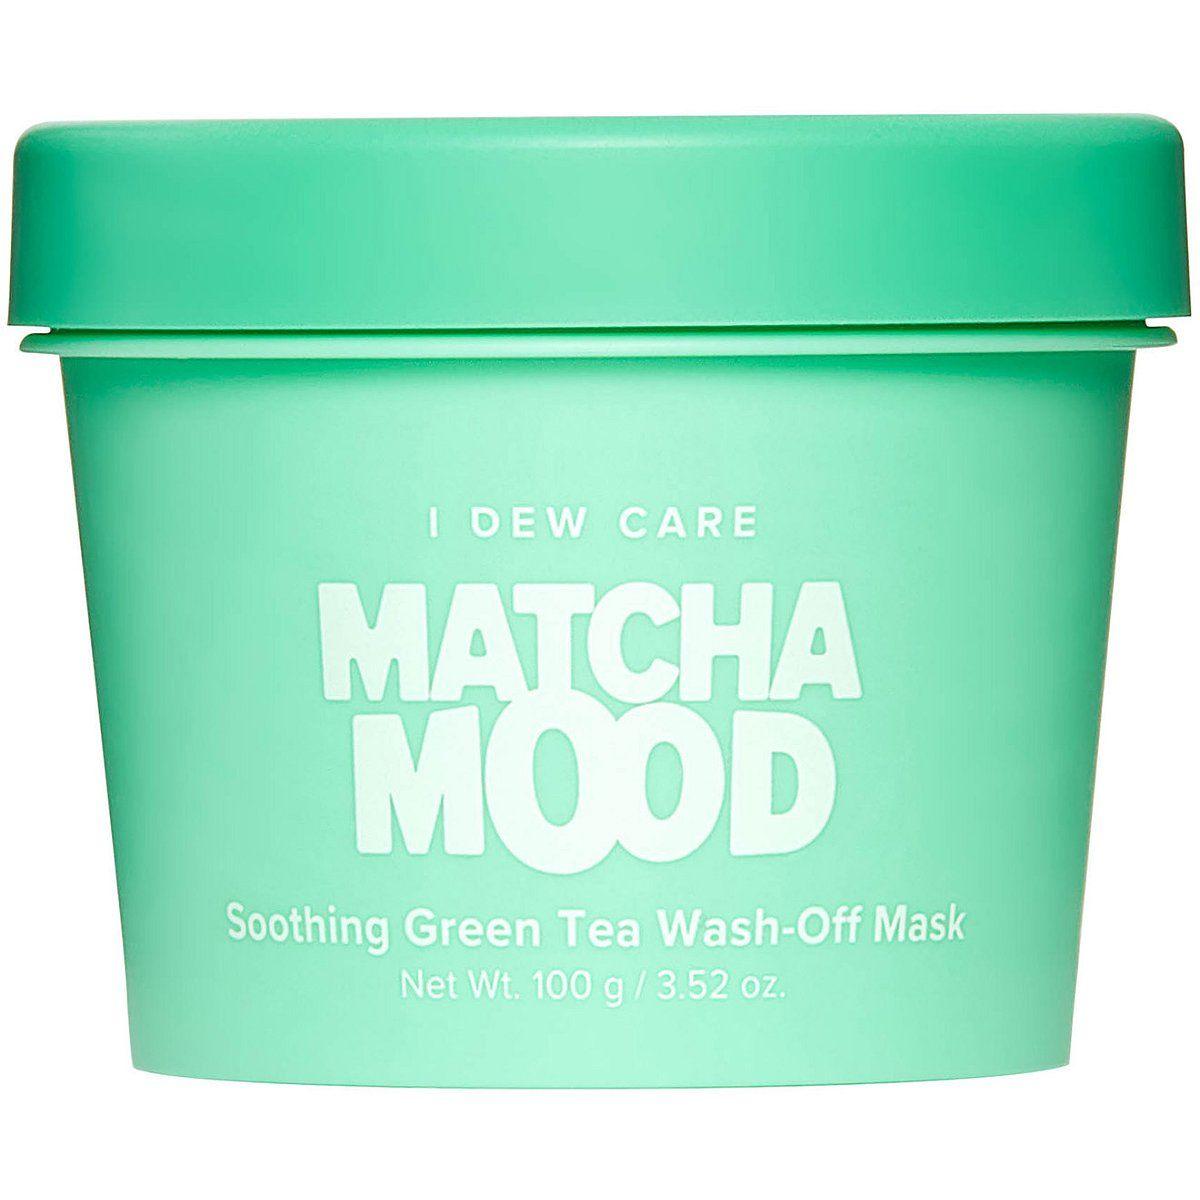 Photo of I Dew Care Matcha Mood Soothing Green Tea Wash-Off Mask | Ulta Beauty